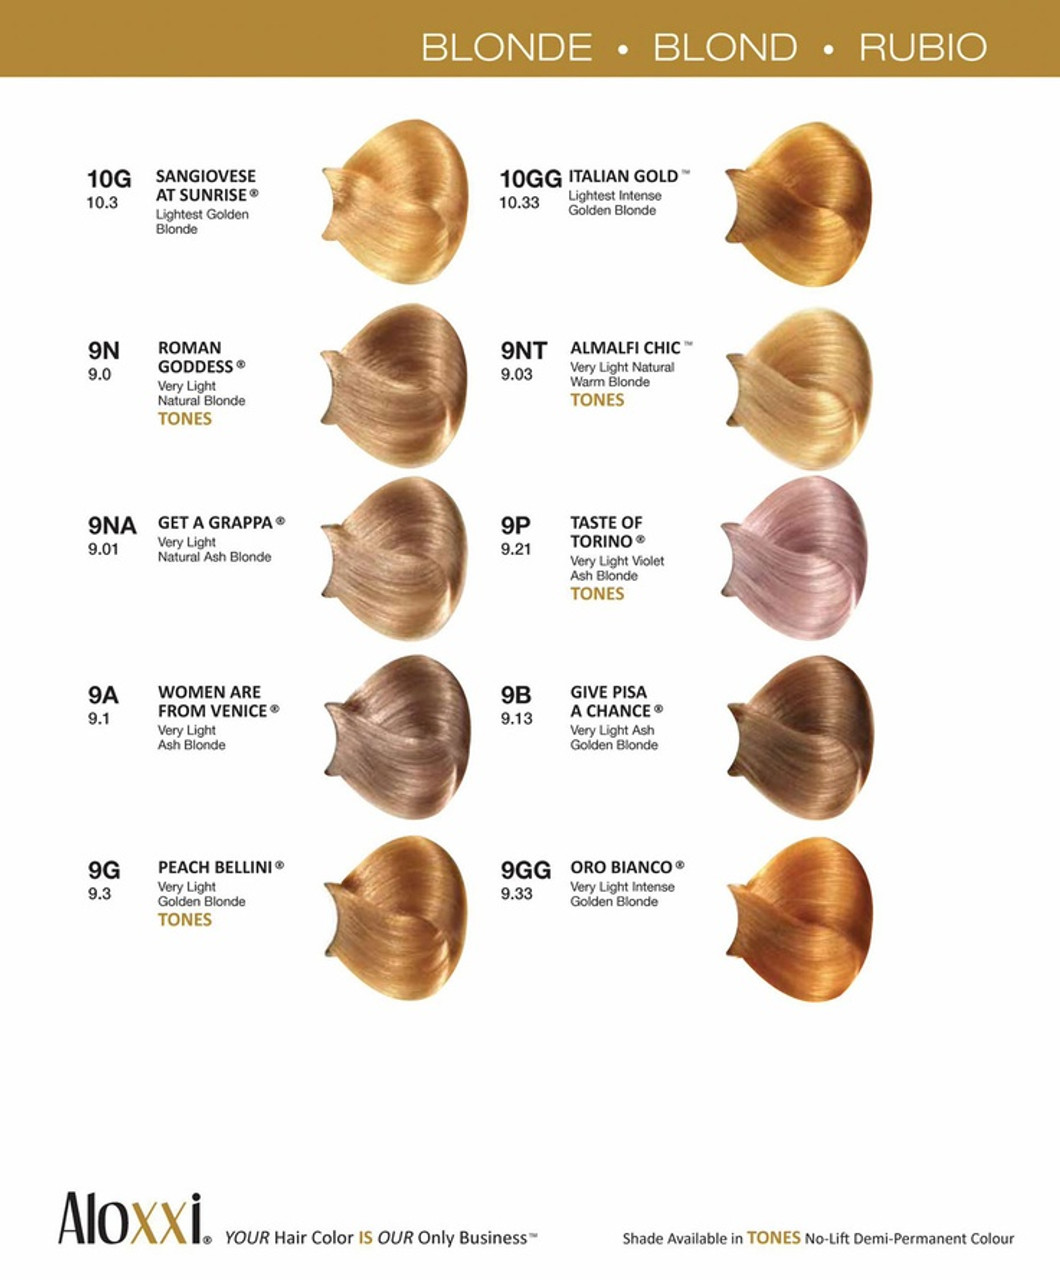 Aloxxi Blondes color chart